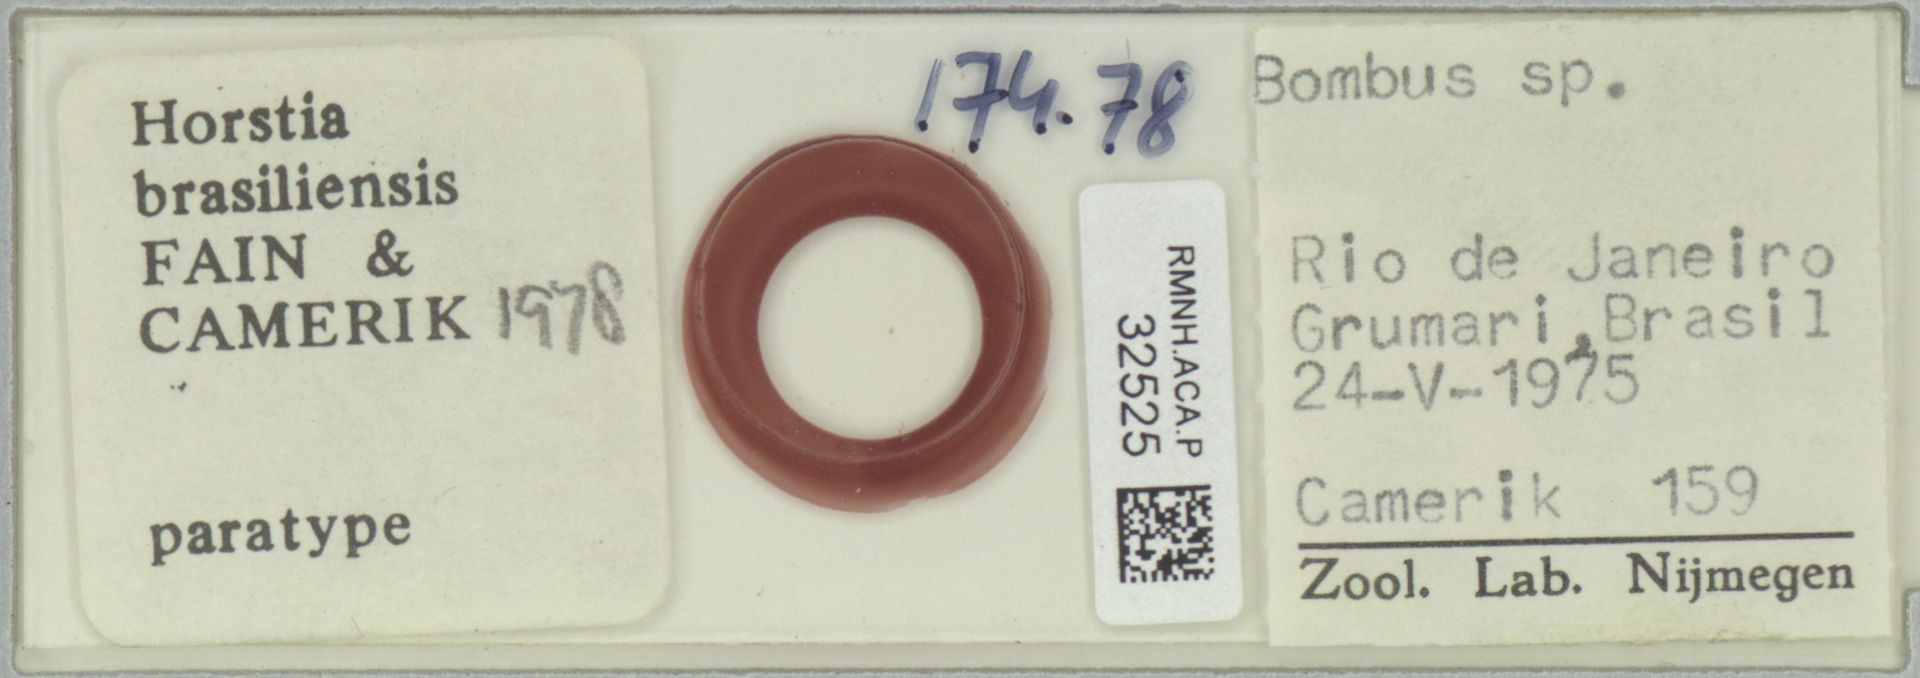 RMNH.ACA.P.32525   Horstia brasiliensis Fain & Camerik 1978